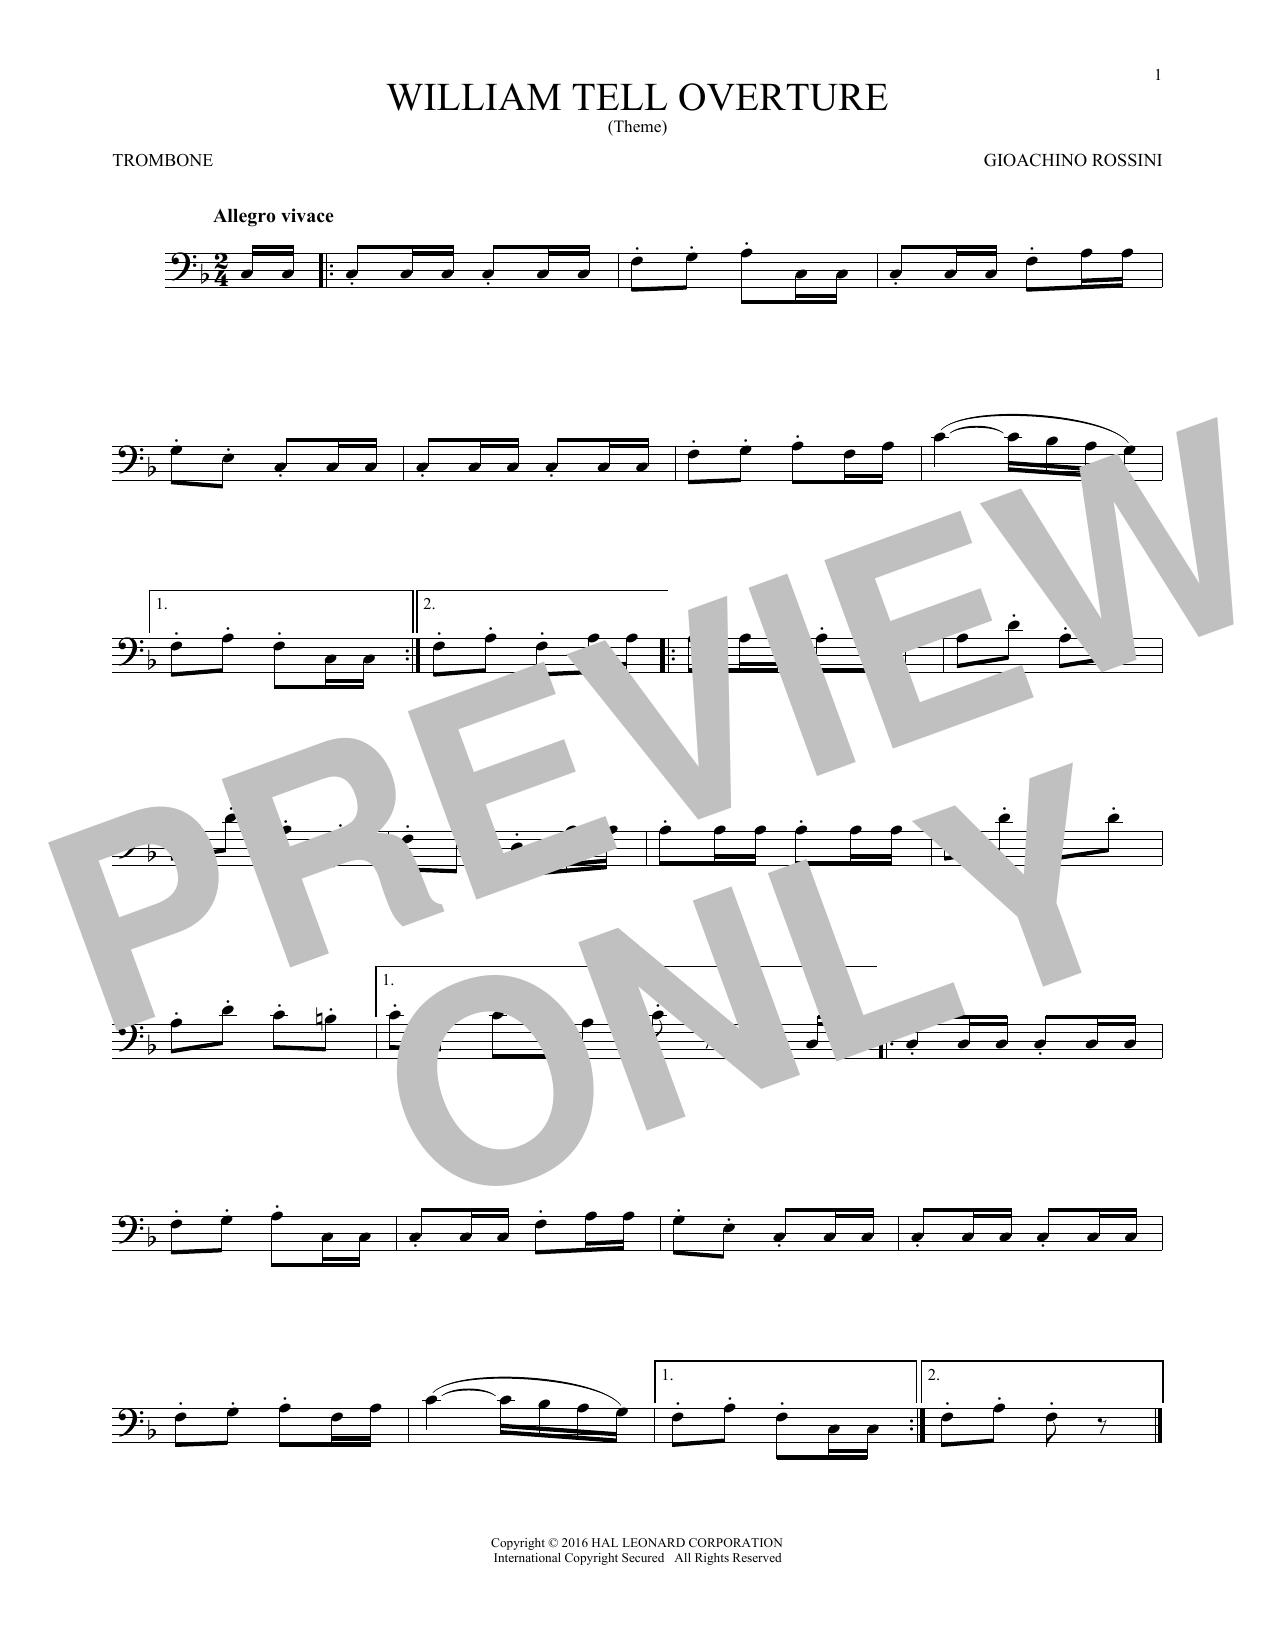 William Tell Overture (Trombone Solo)